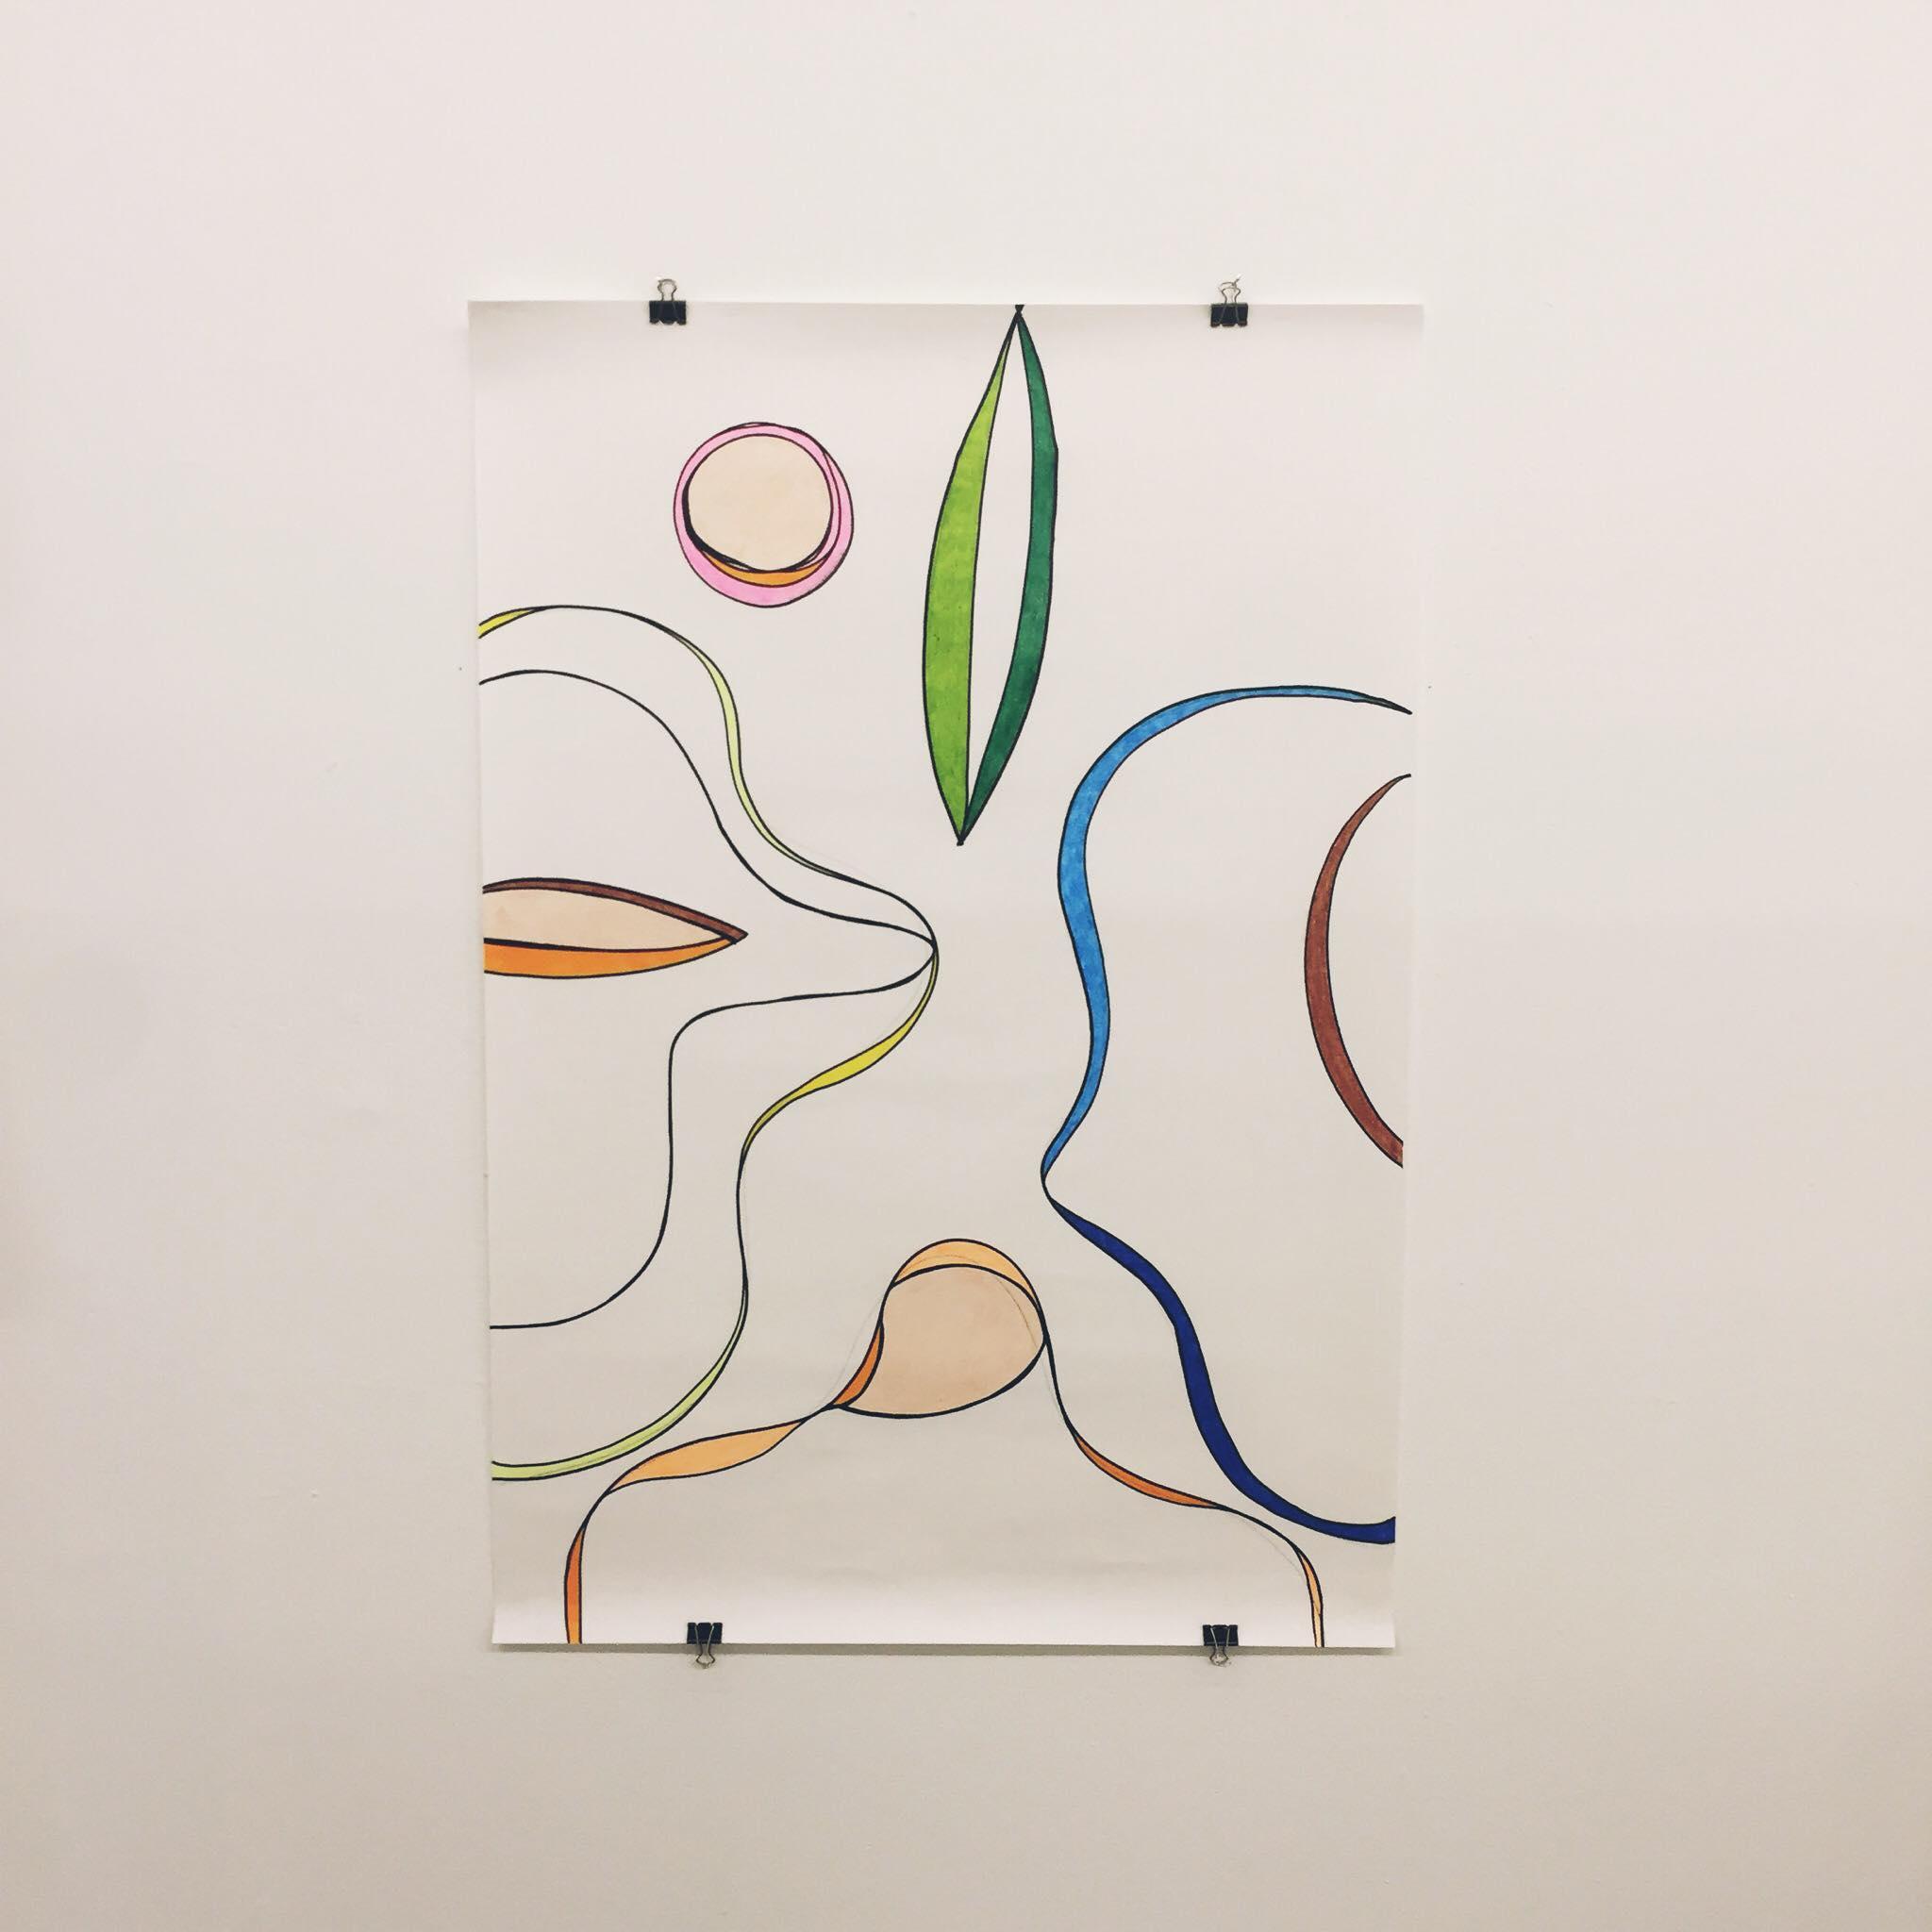 Guanabara I Serie Formas Contrassexuais Acrilica, grafite e giz de cera sobre fine face 95x65 2019